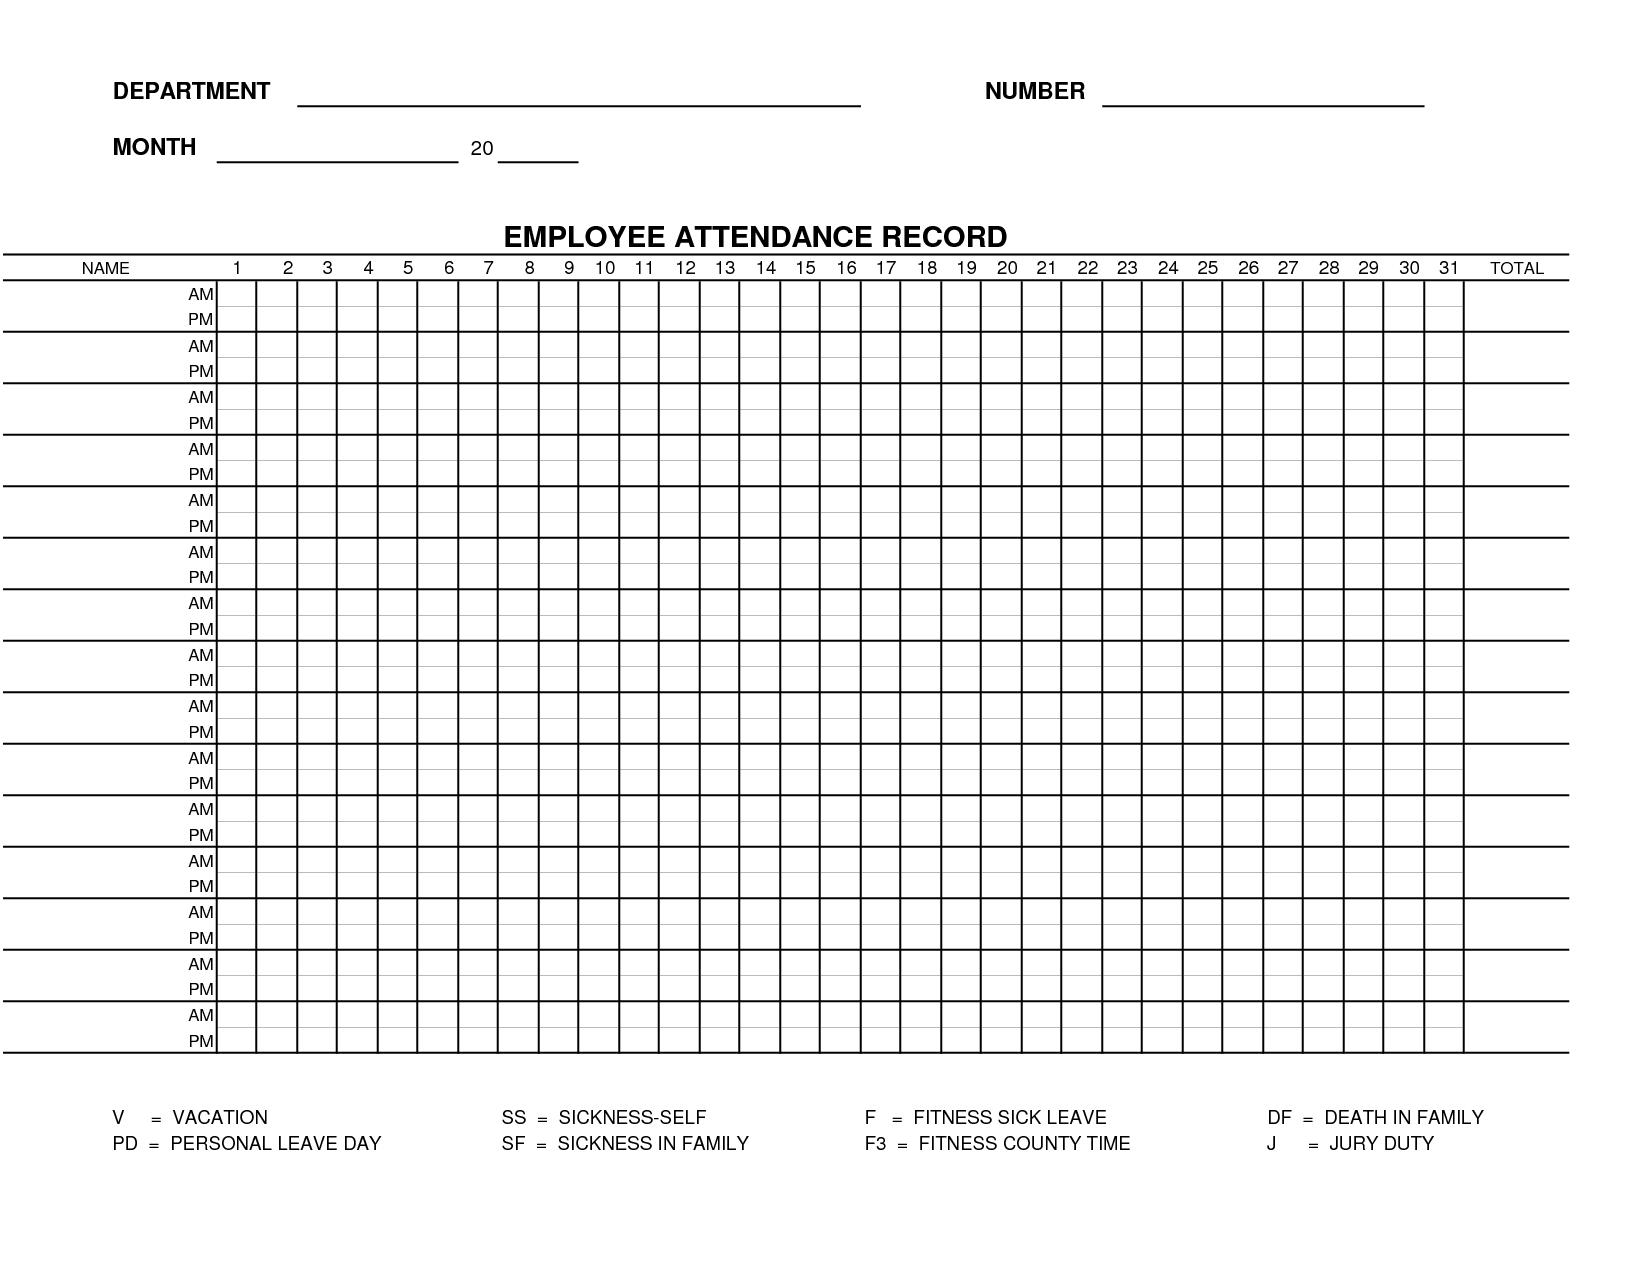 Printable Employee Attendance Sheet Template | Form 15 - Employee - Free Printable Attendance Forms For Teachers